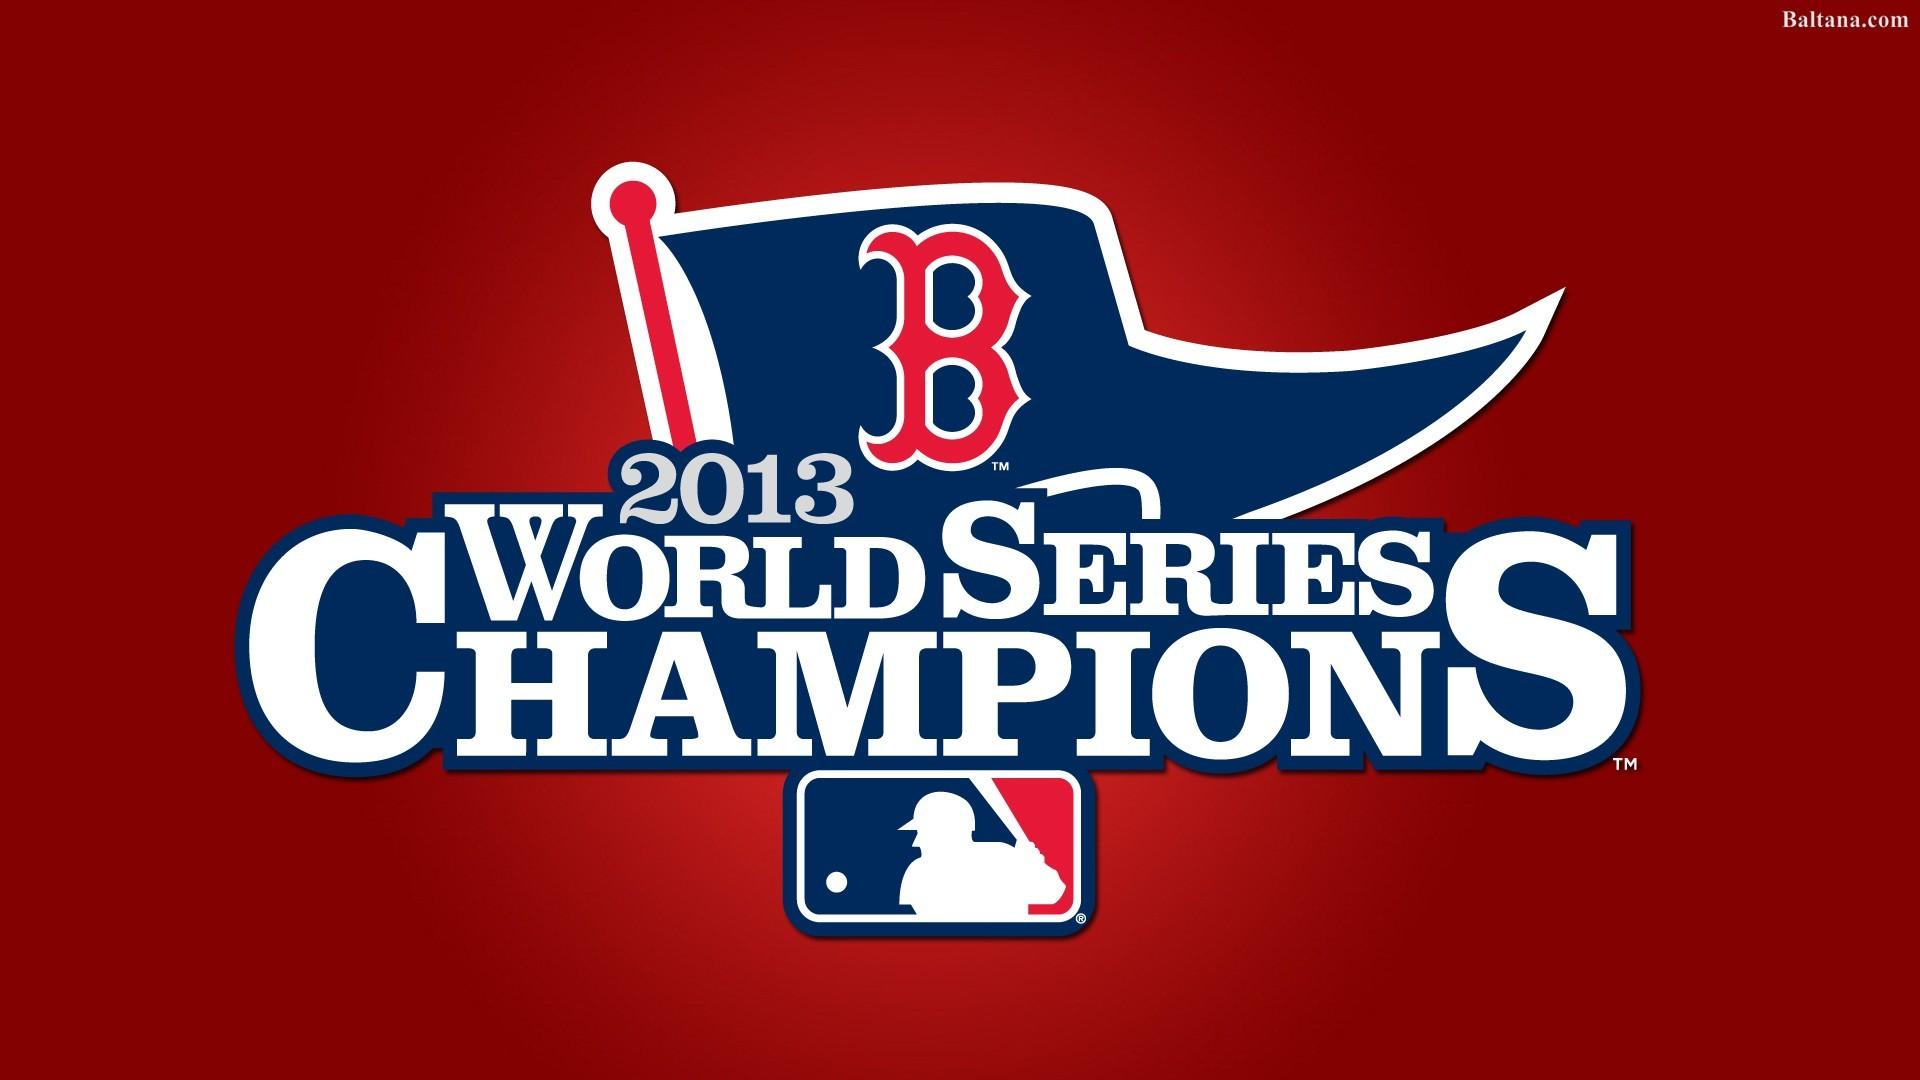 Boston Red Sox Best Wallpaper 33003   Baltana 1920x1080